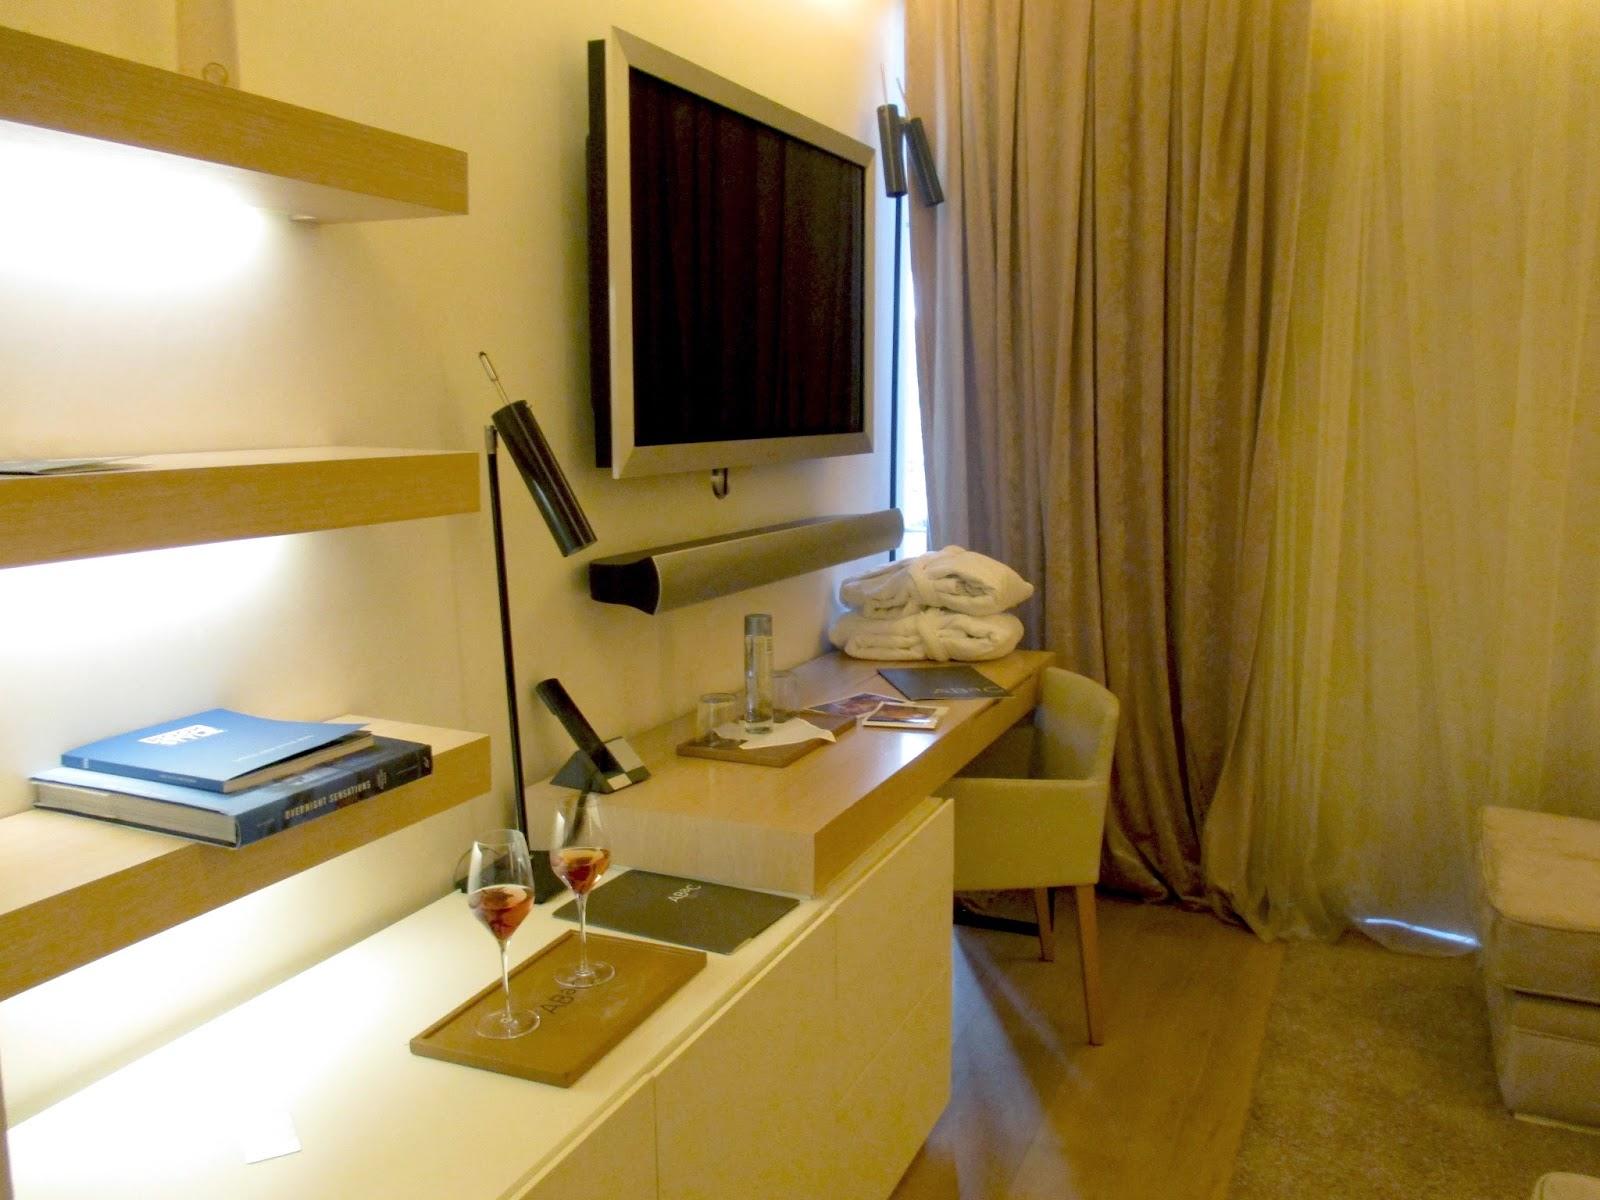 http://www.abacbarcelona.com/es/habitaciones/standard